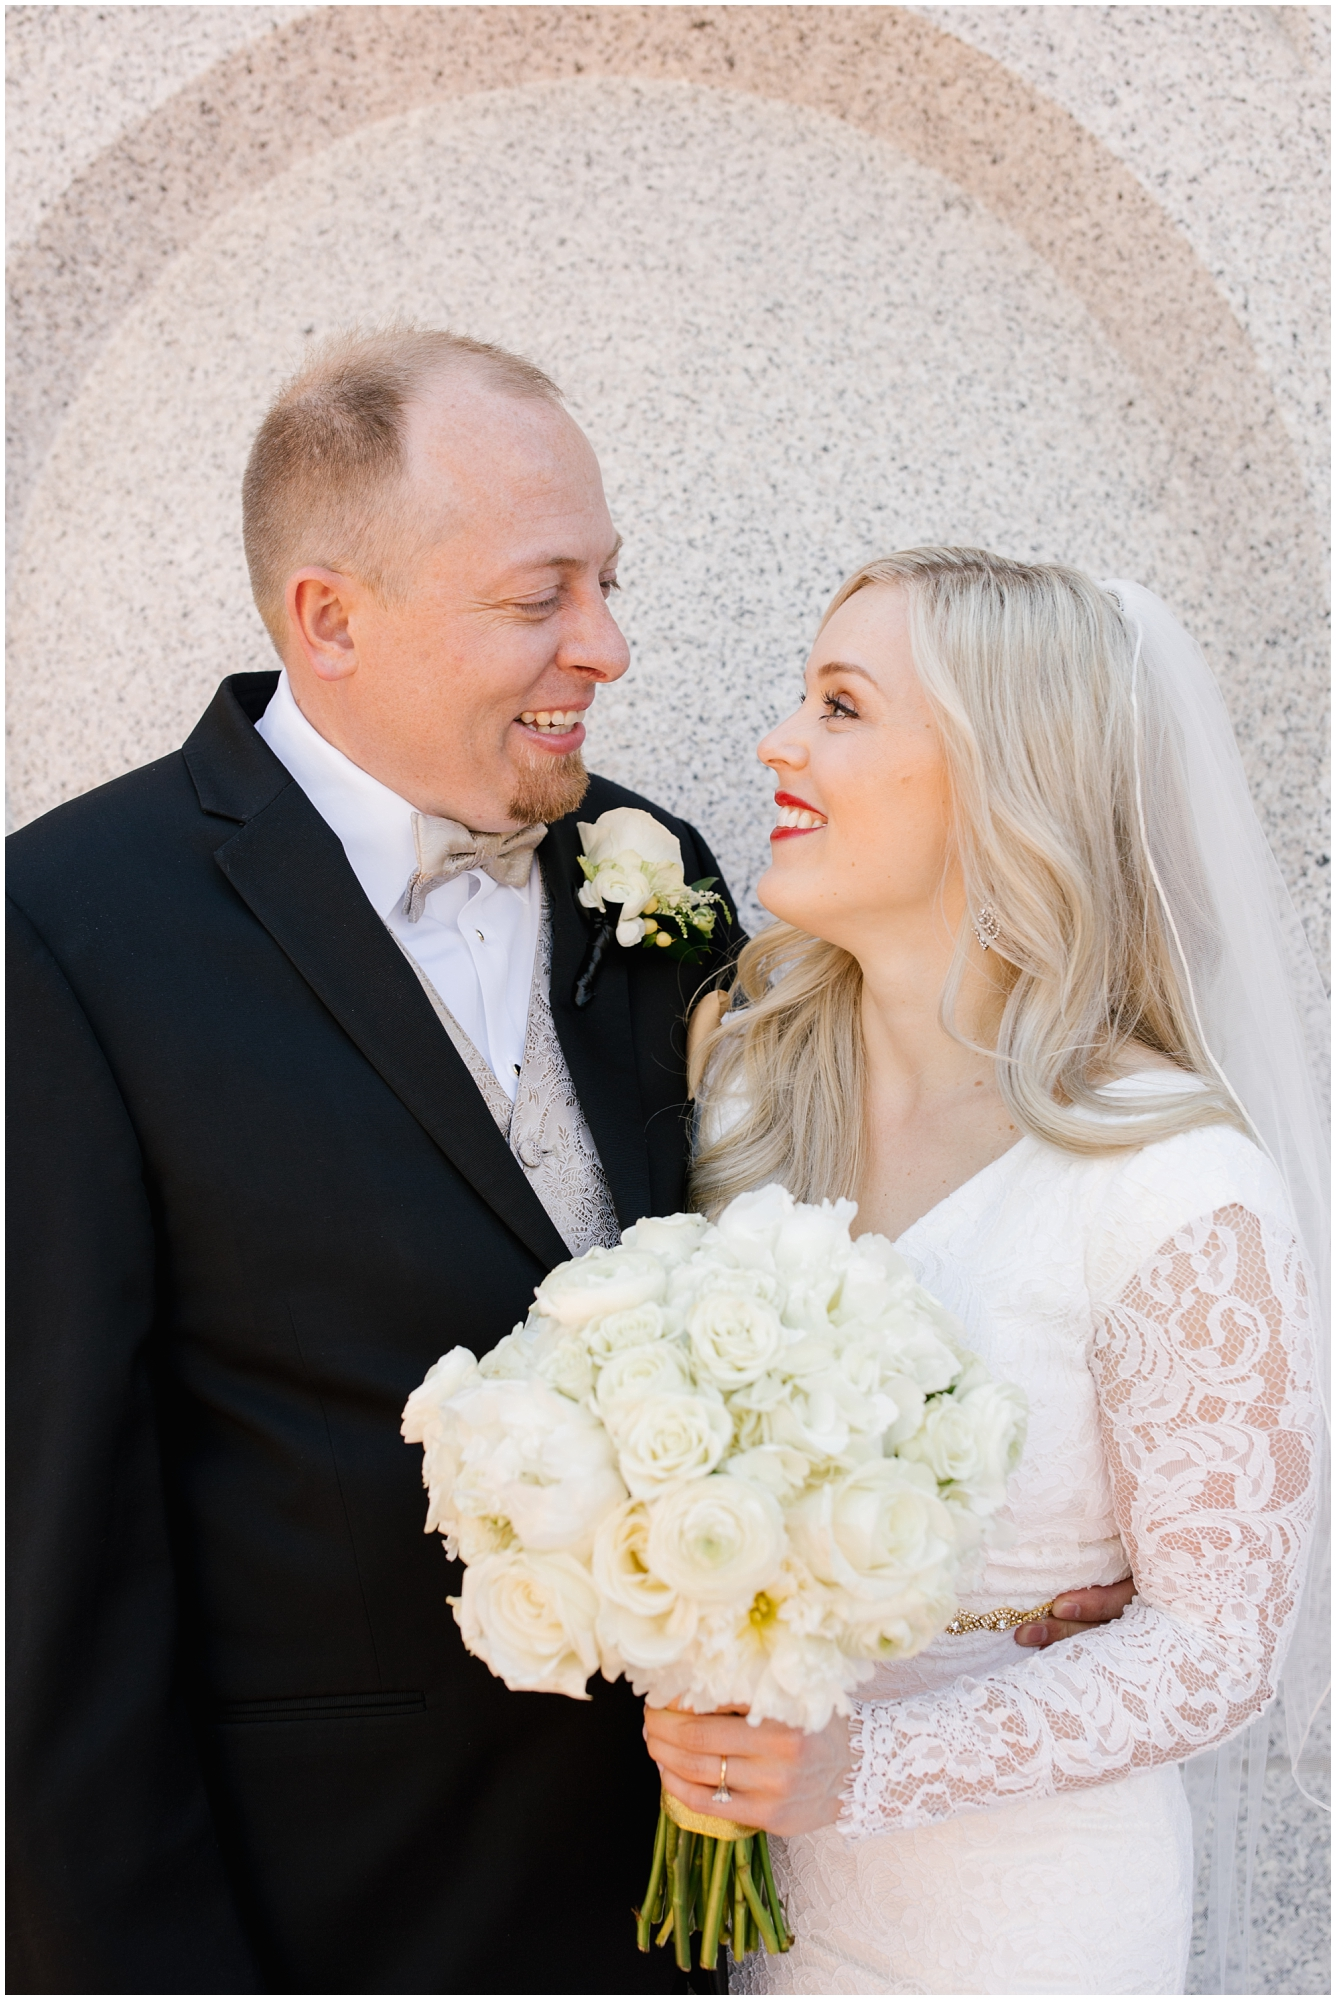 CherylandTyler-166_Lizzie-B-Imagery-Utah-Wedding-Photographer-Park-City-Salt-Lake-City-Temple-Wells-Fargo-Building.jpg